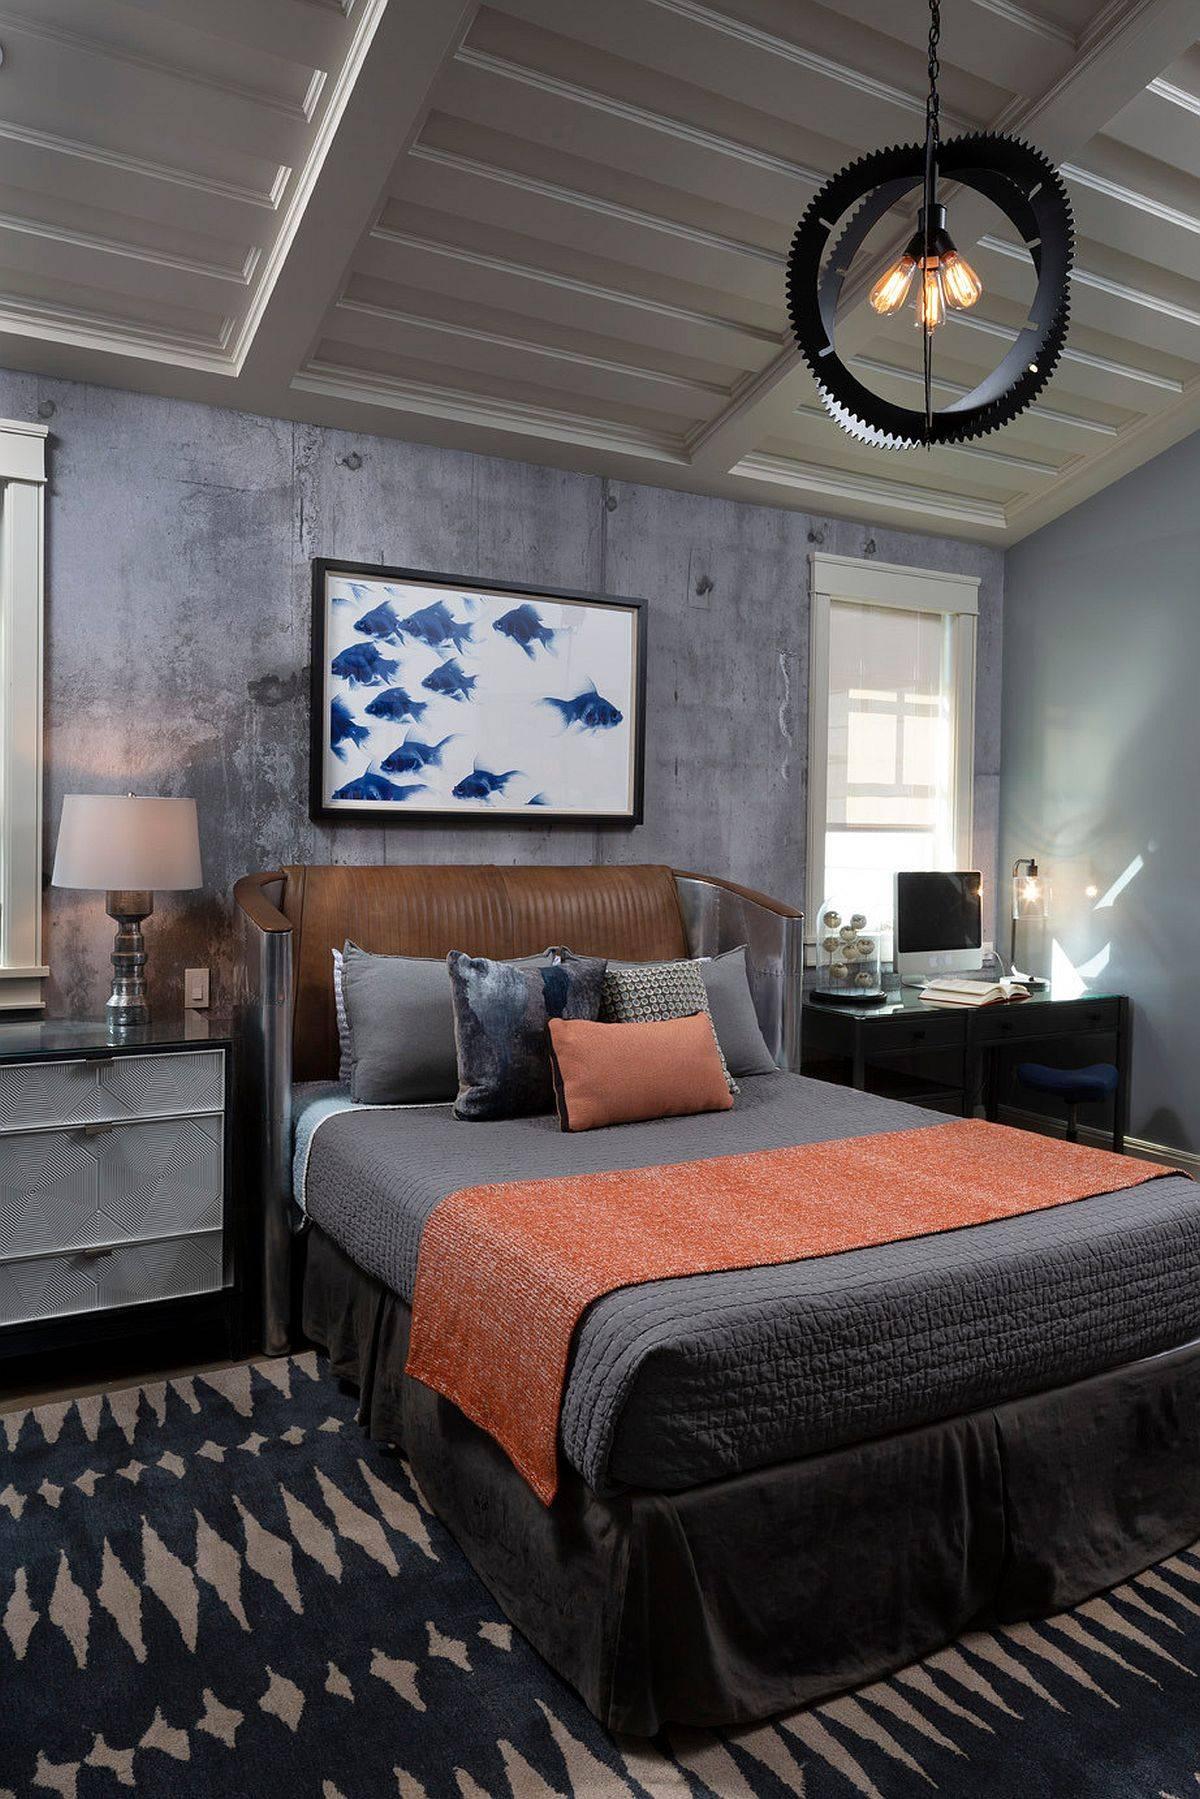 Kamar tidur-remaja-remaja-gaya-industri-dengan-abu-abu-beton-semuanya-dan-pencahayaan-industri-luar biasa-53112